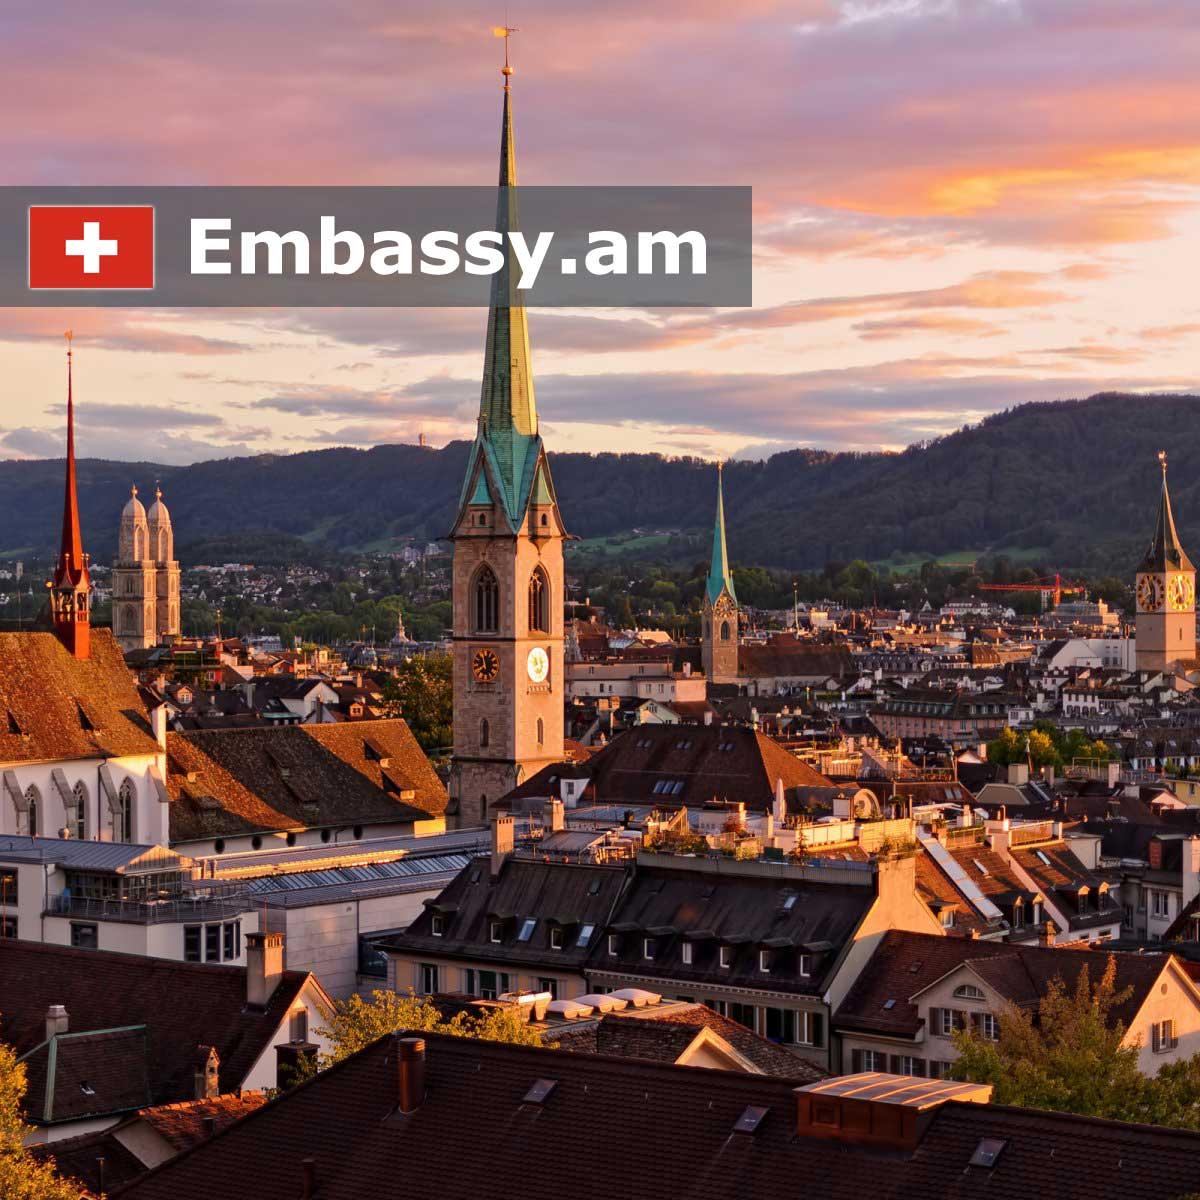 Hotels in Switzerland - Embassy.am